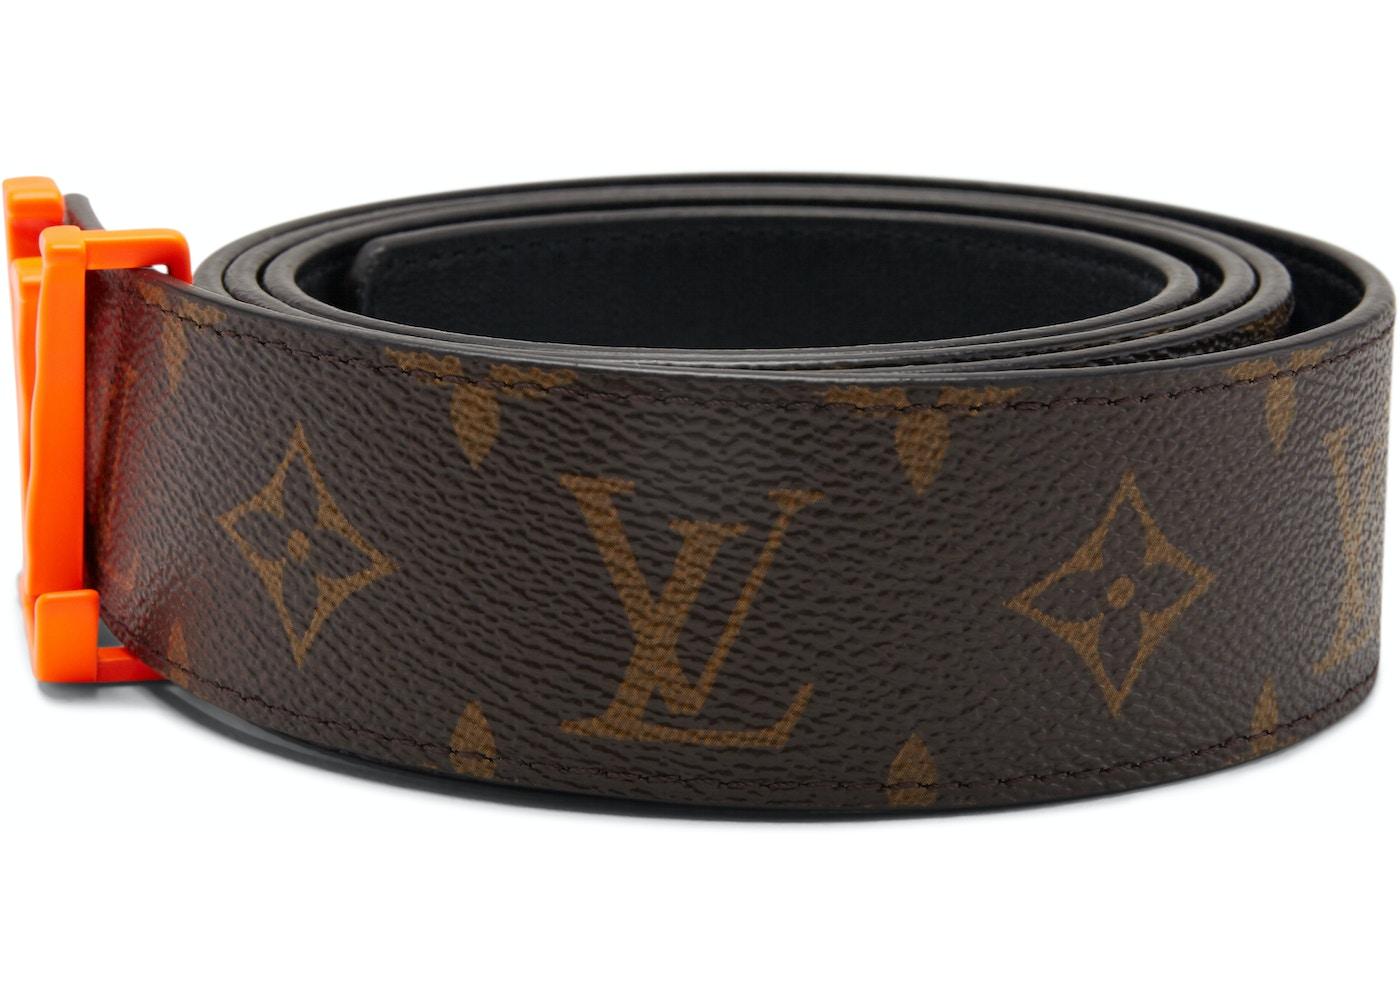 ba14683b66 Buy & Sell Luxury Handbags